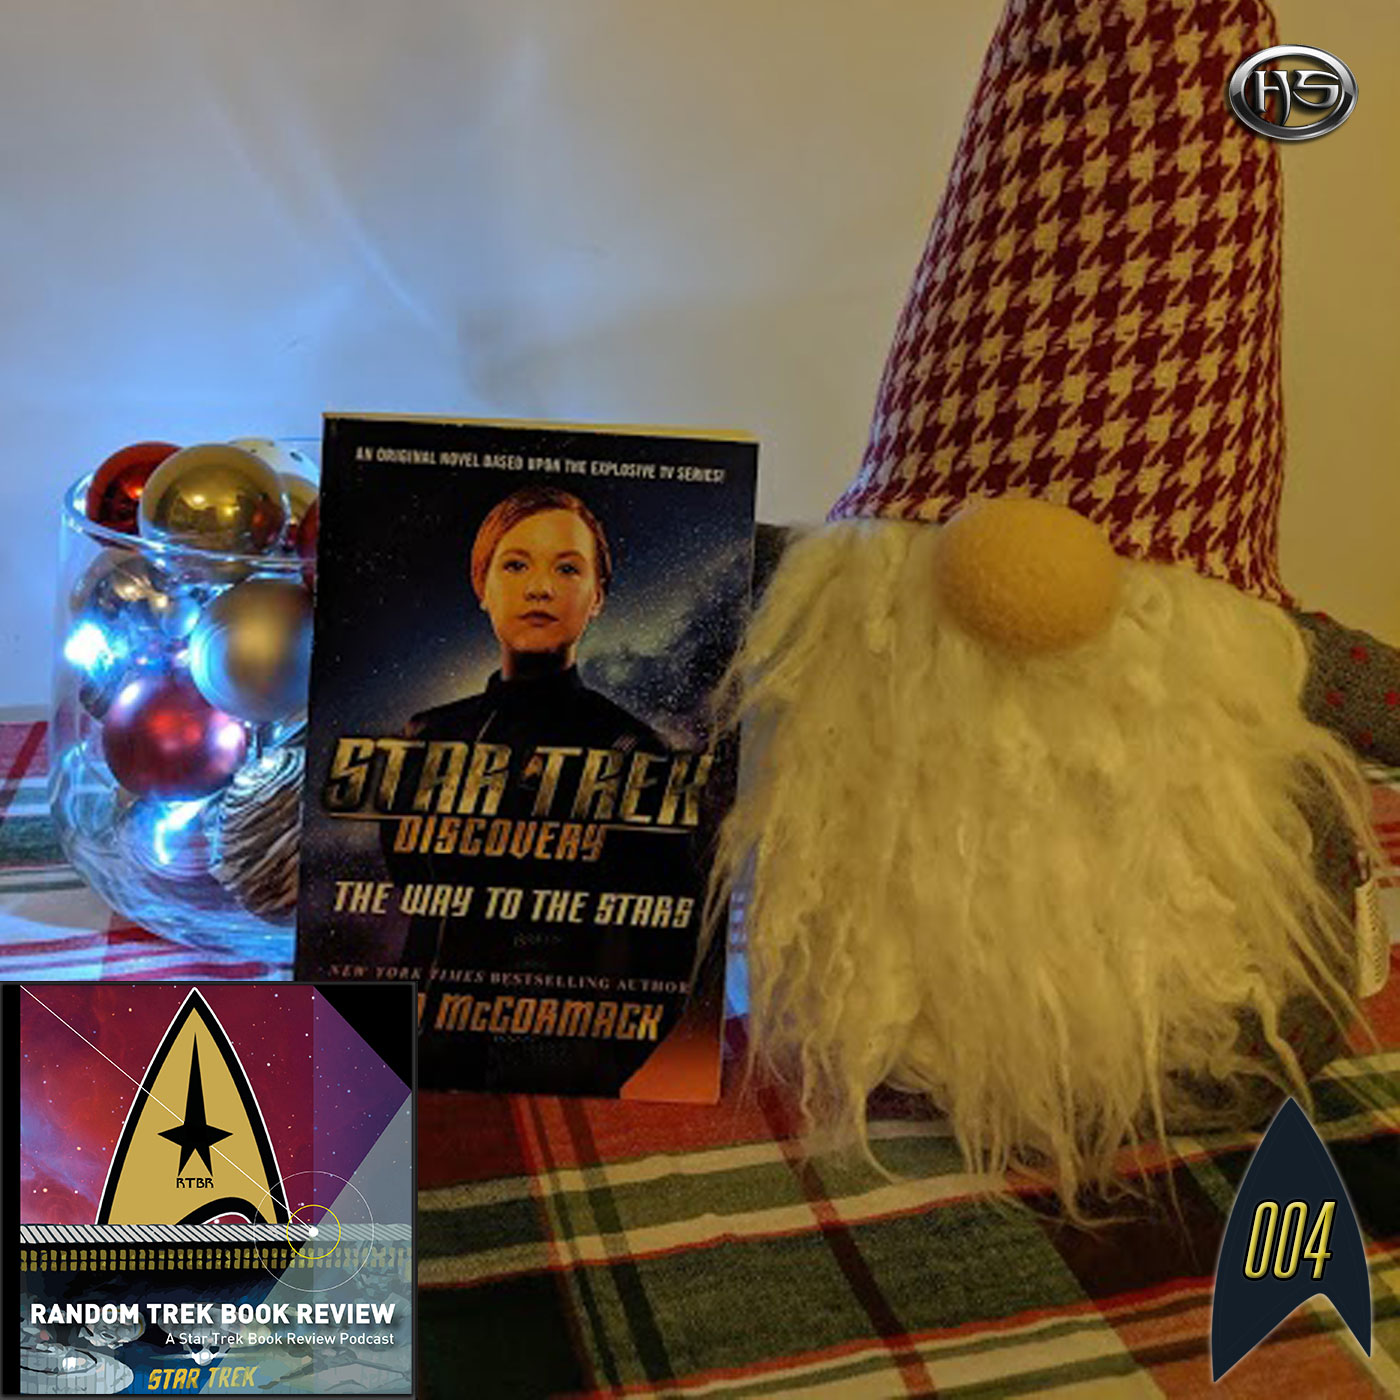 Random Trek Book Review Episode 4